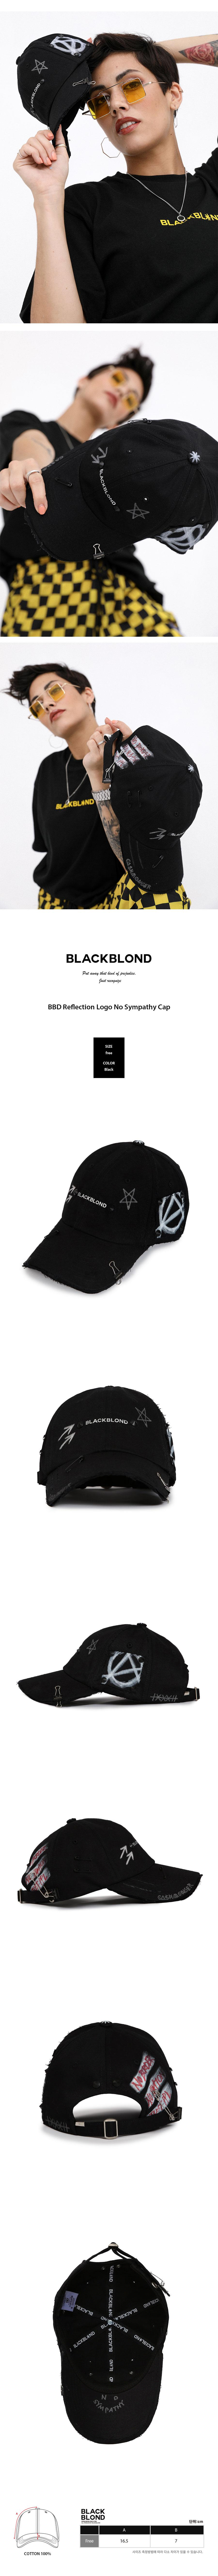 BBD-Reflection-Logo-No-Sympathy-Cap-%28Black%29.jpg